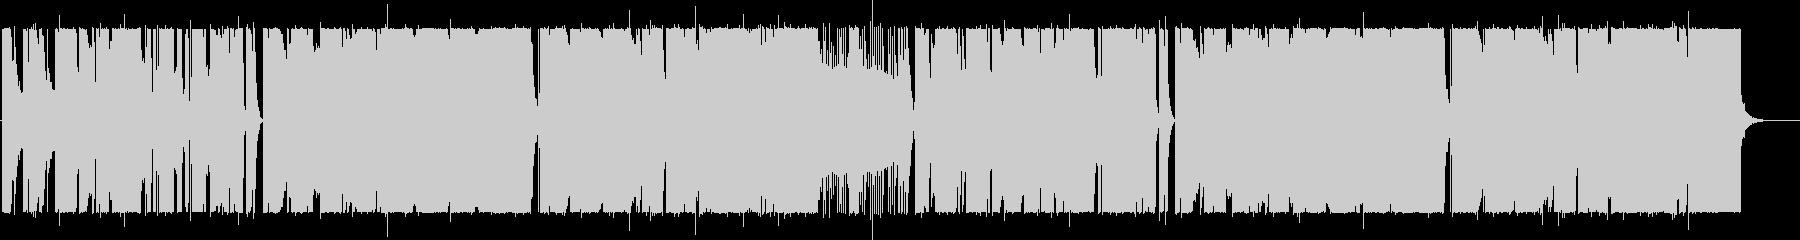 Sad and moody BGM's unreproduced waveform